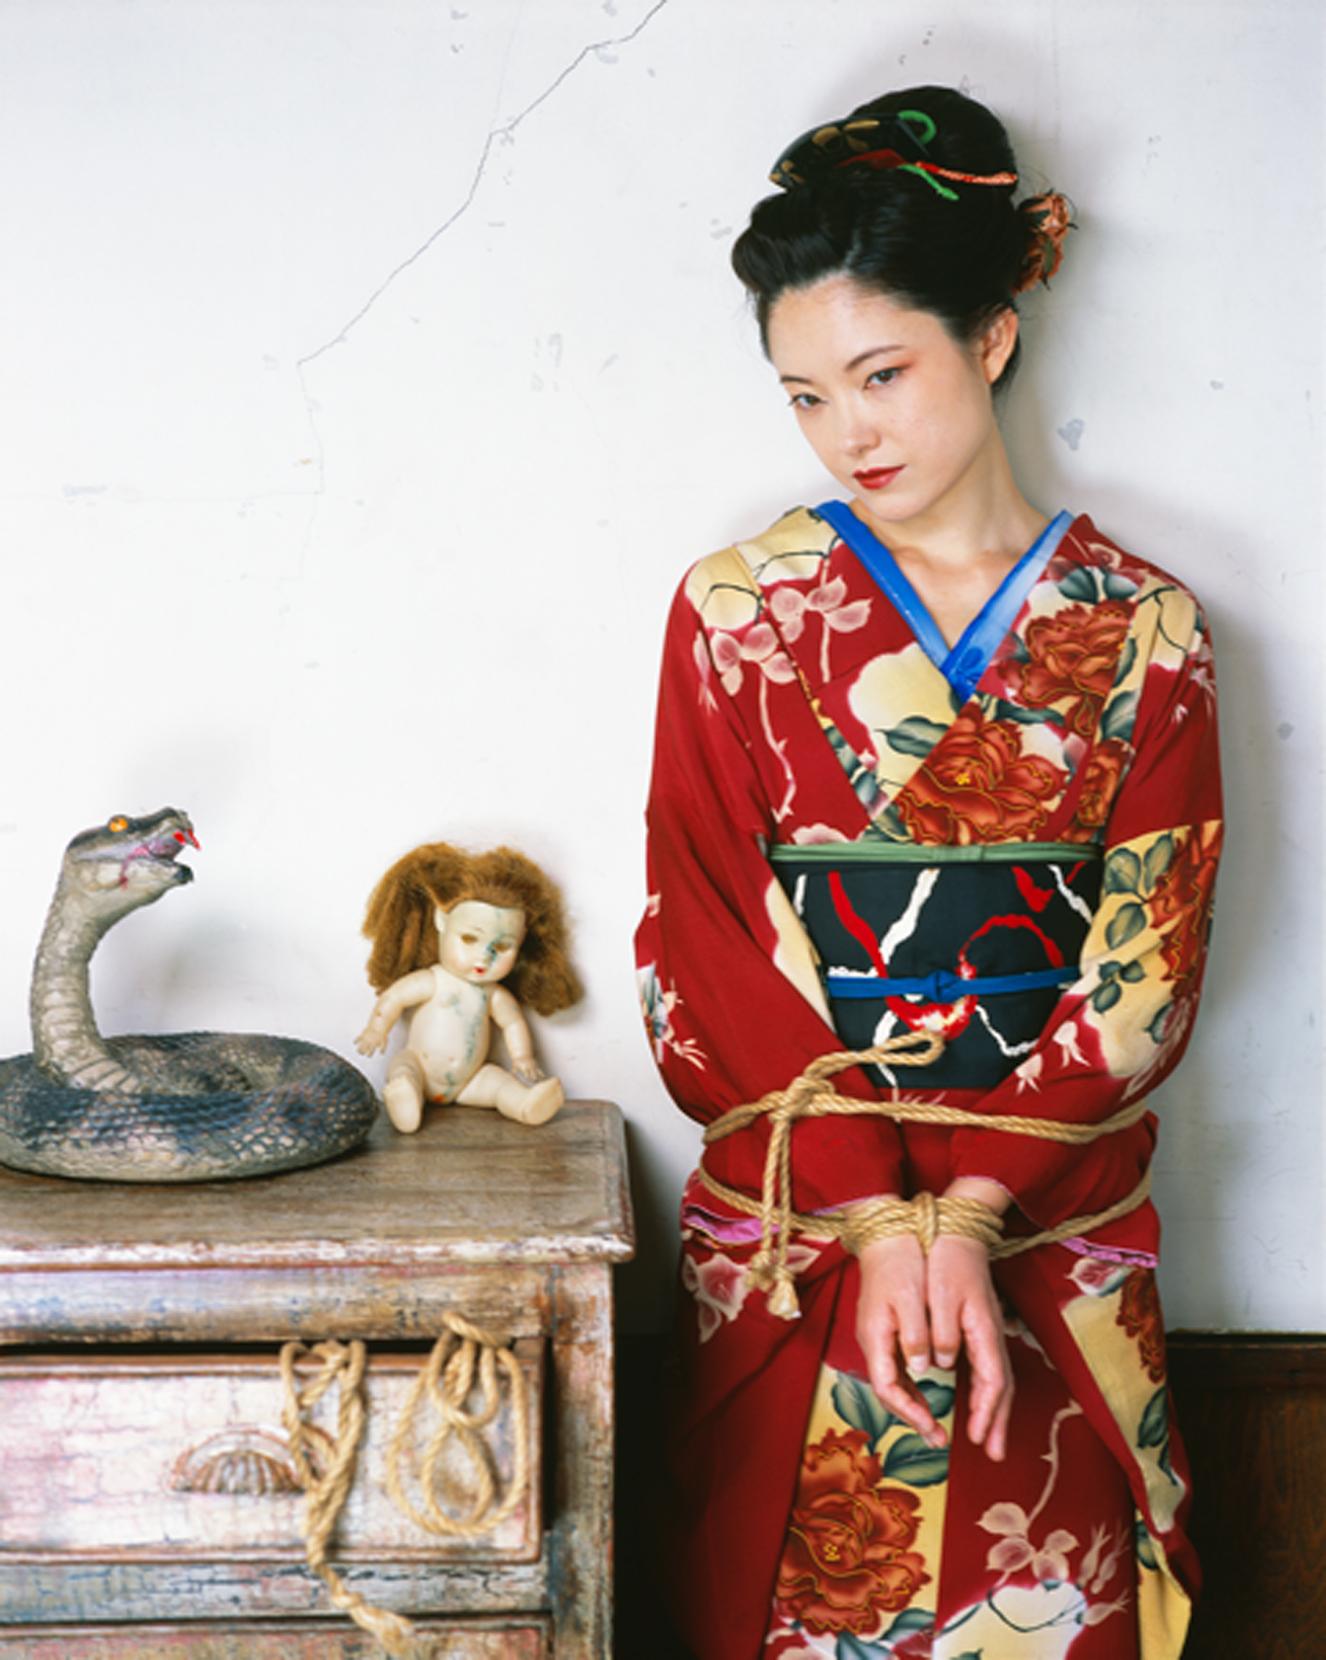 508© Nobuyoshi Araki Courtesy the artist and galerie kamel mennour Paris London